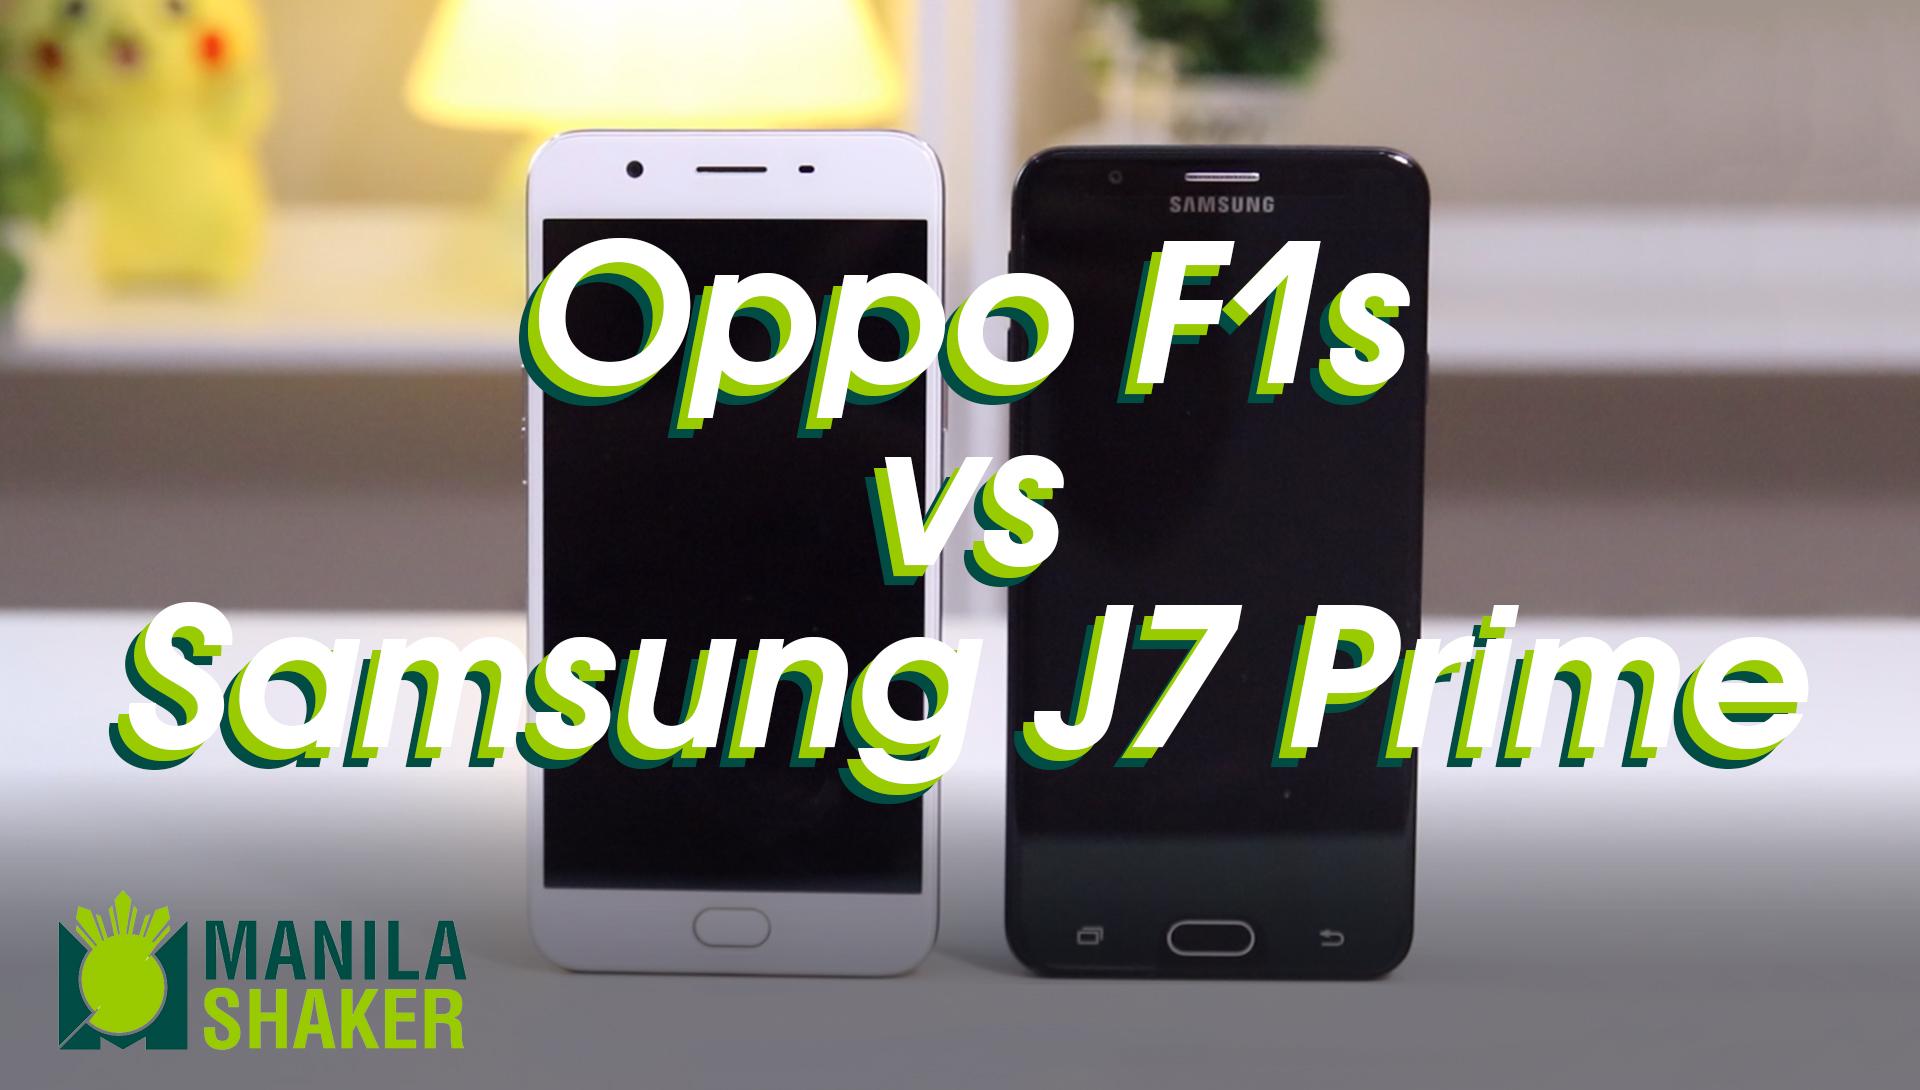 Phone Off Samsung Galaxy J7 Prime Vs OPPO F1s